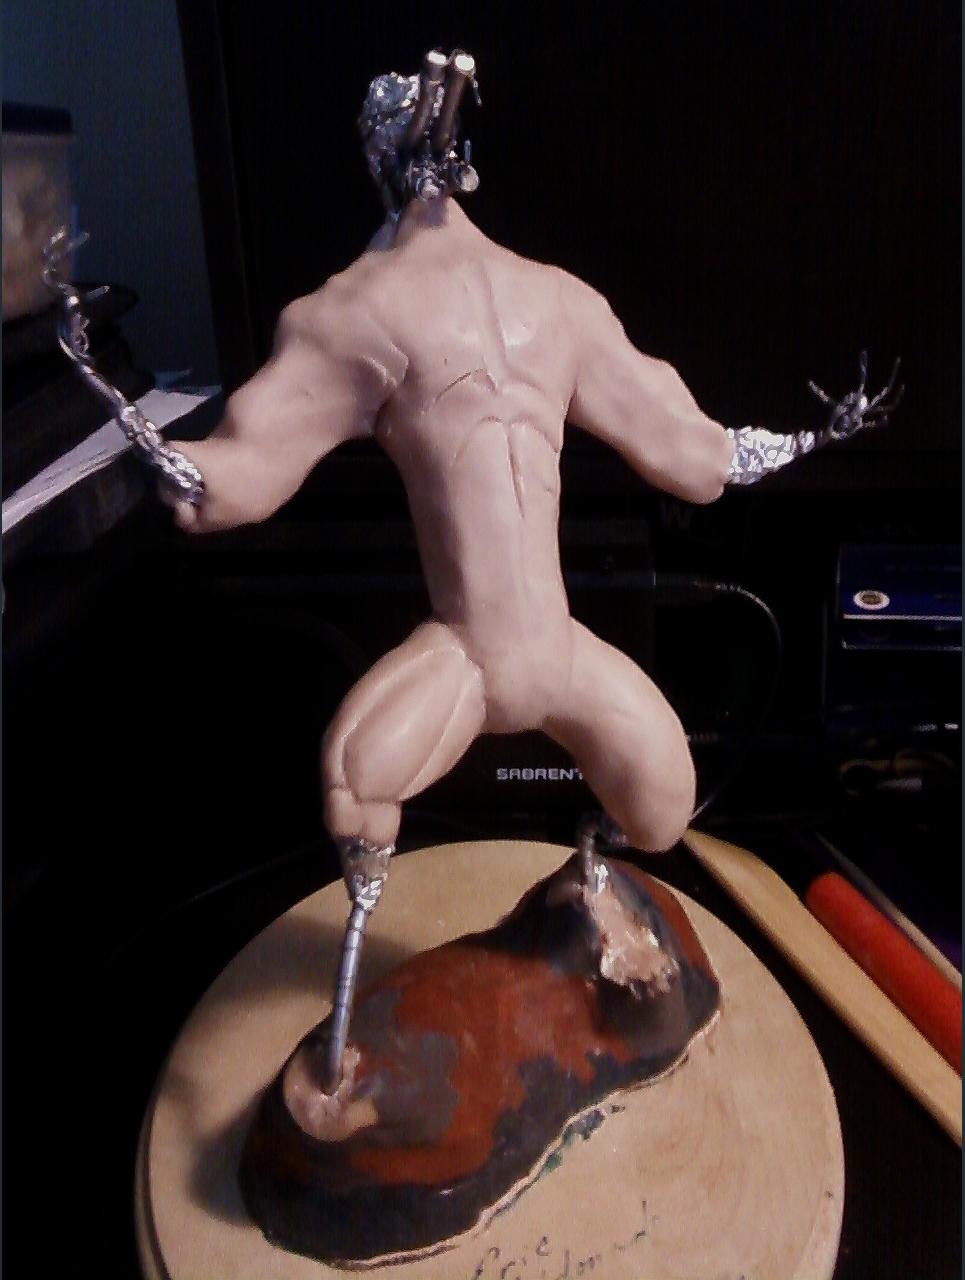 Werewolf maquette   adding body filler show